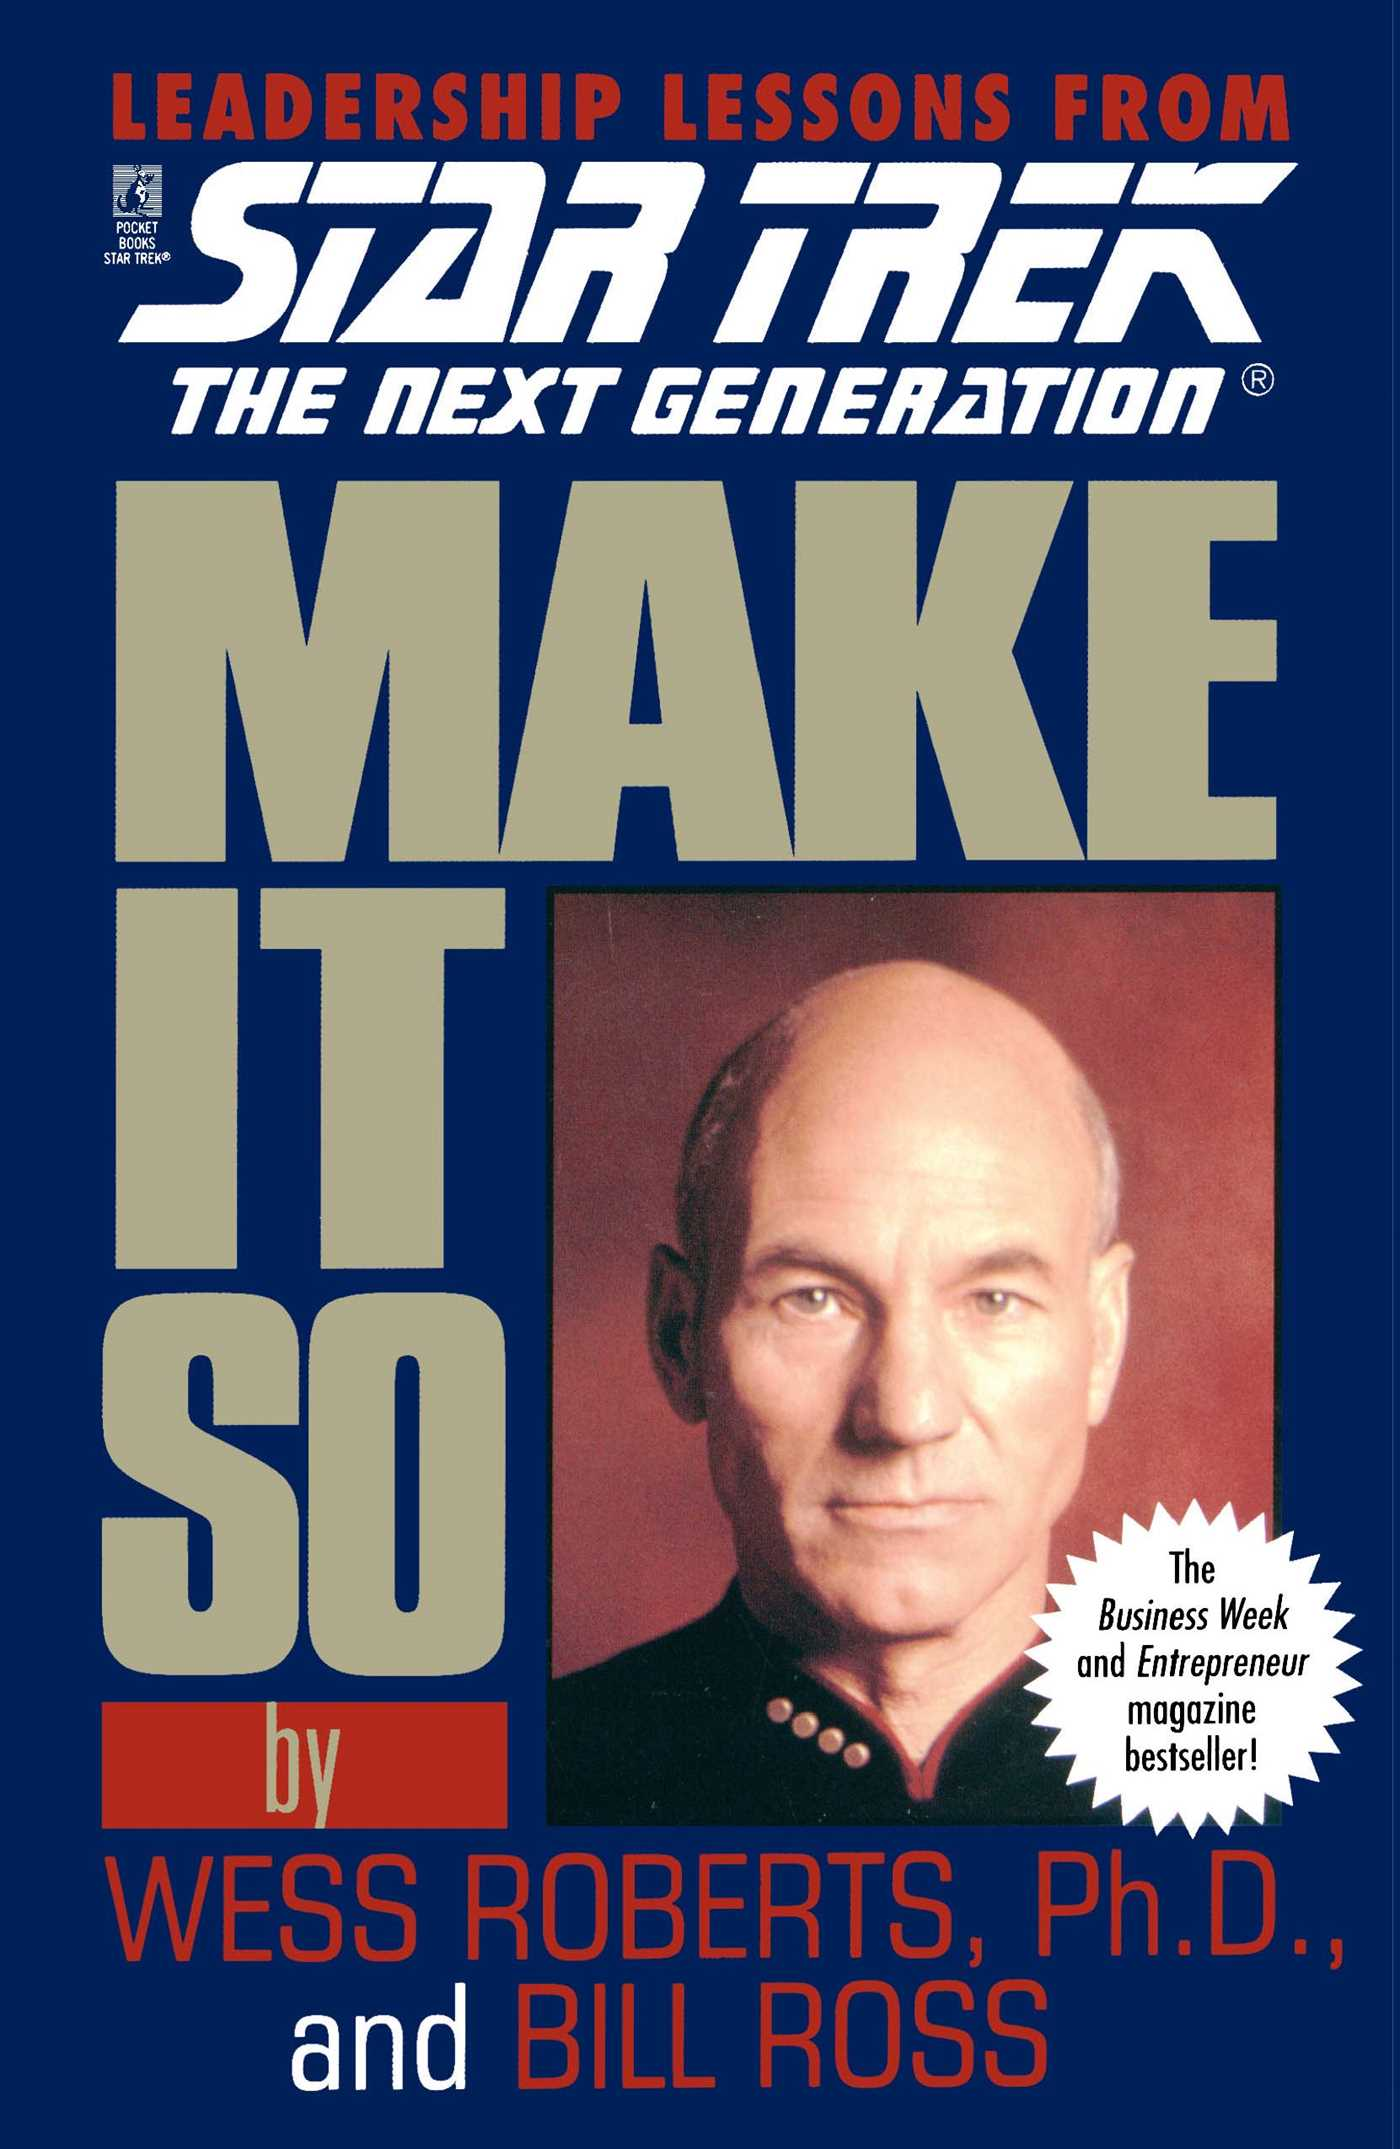 Star trek make it so leadership lessons from star trek the next generation 9781439108284 hr